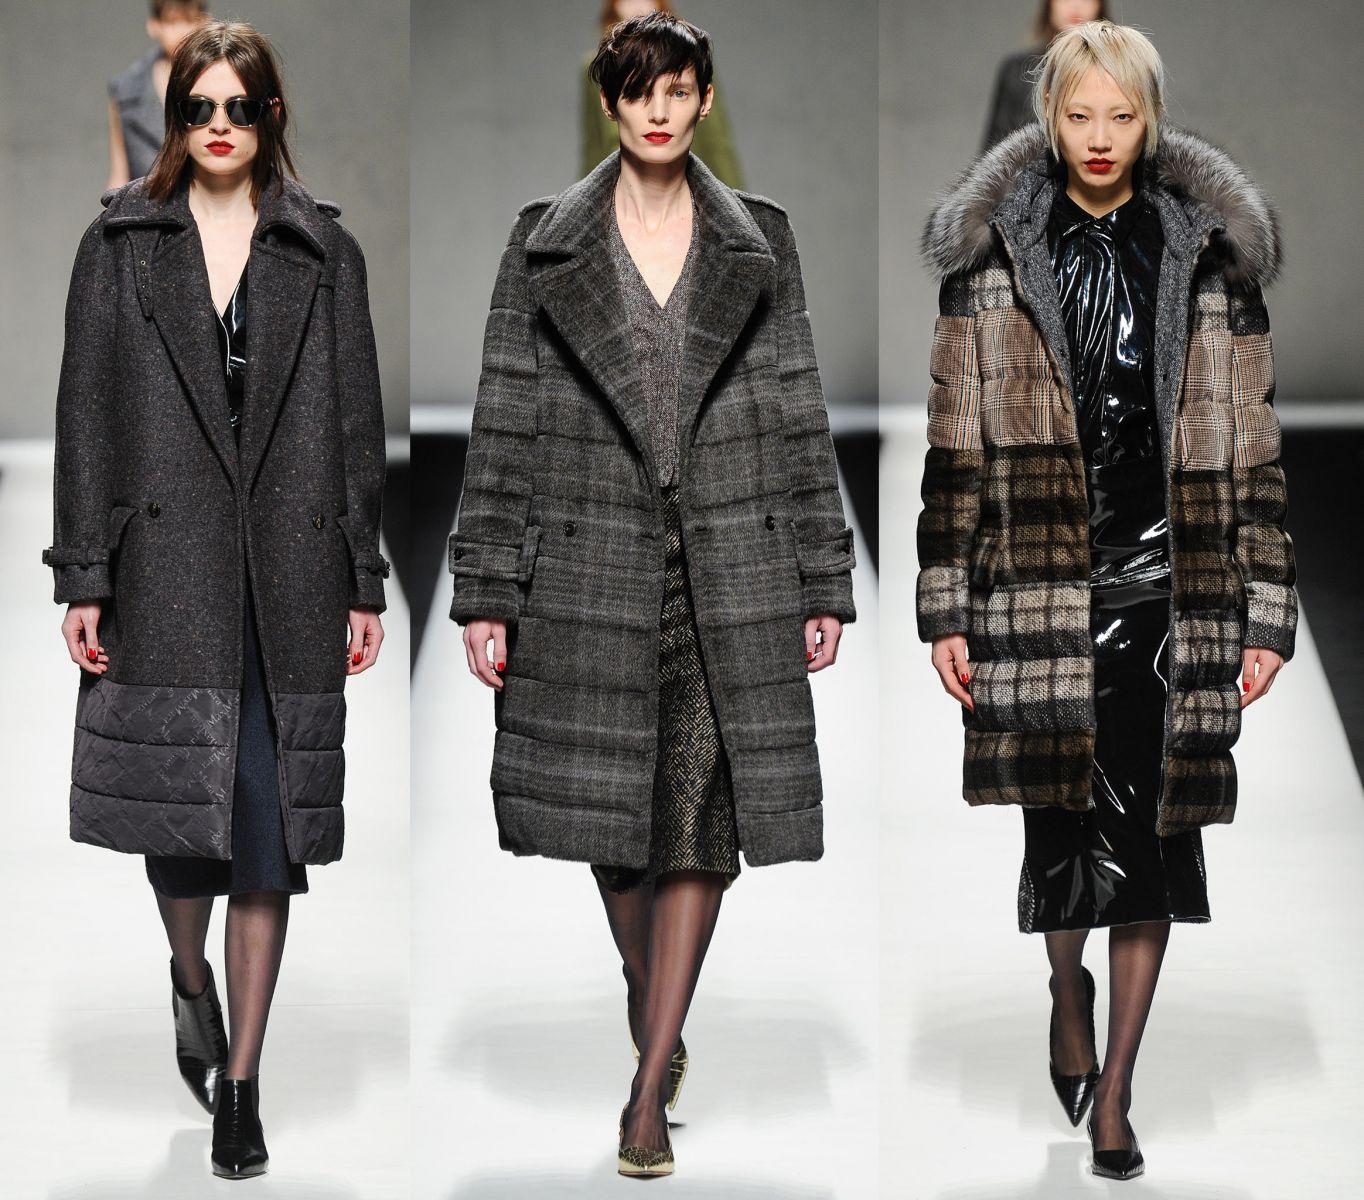 Пальто Max Mara - фото №3